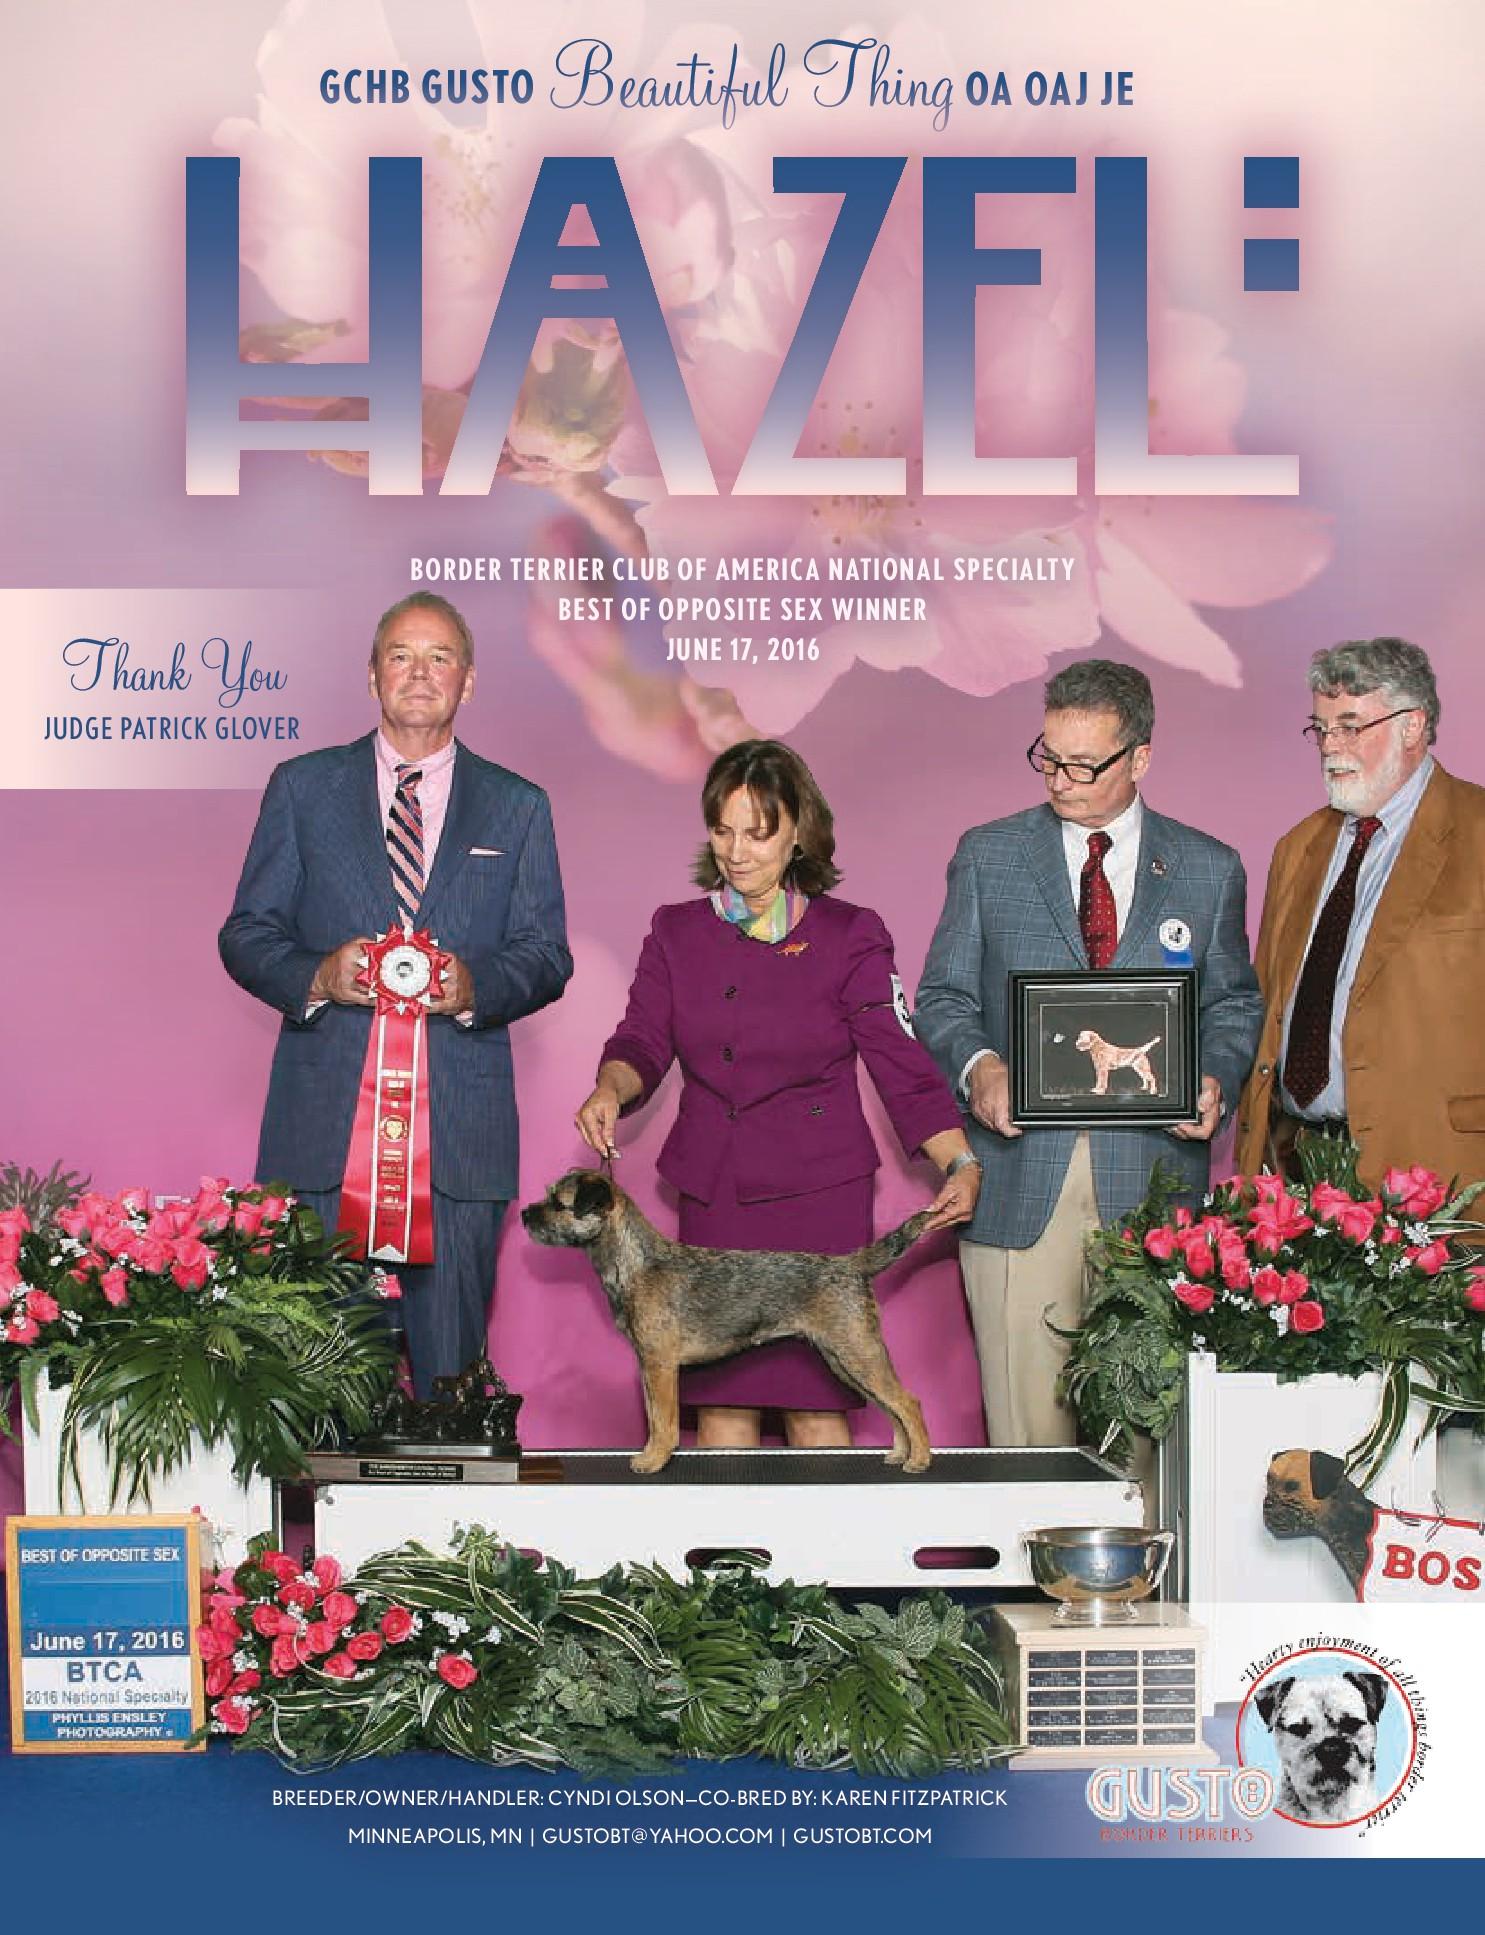 showsight-ad-hazel-final-201609